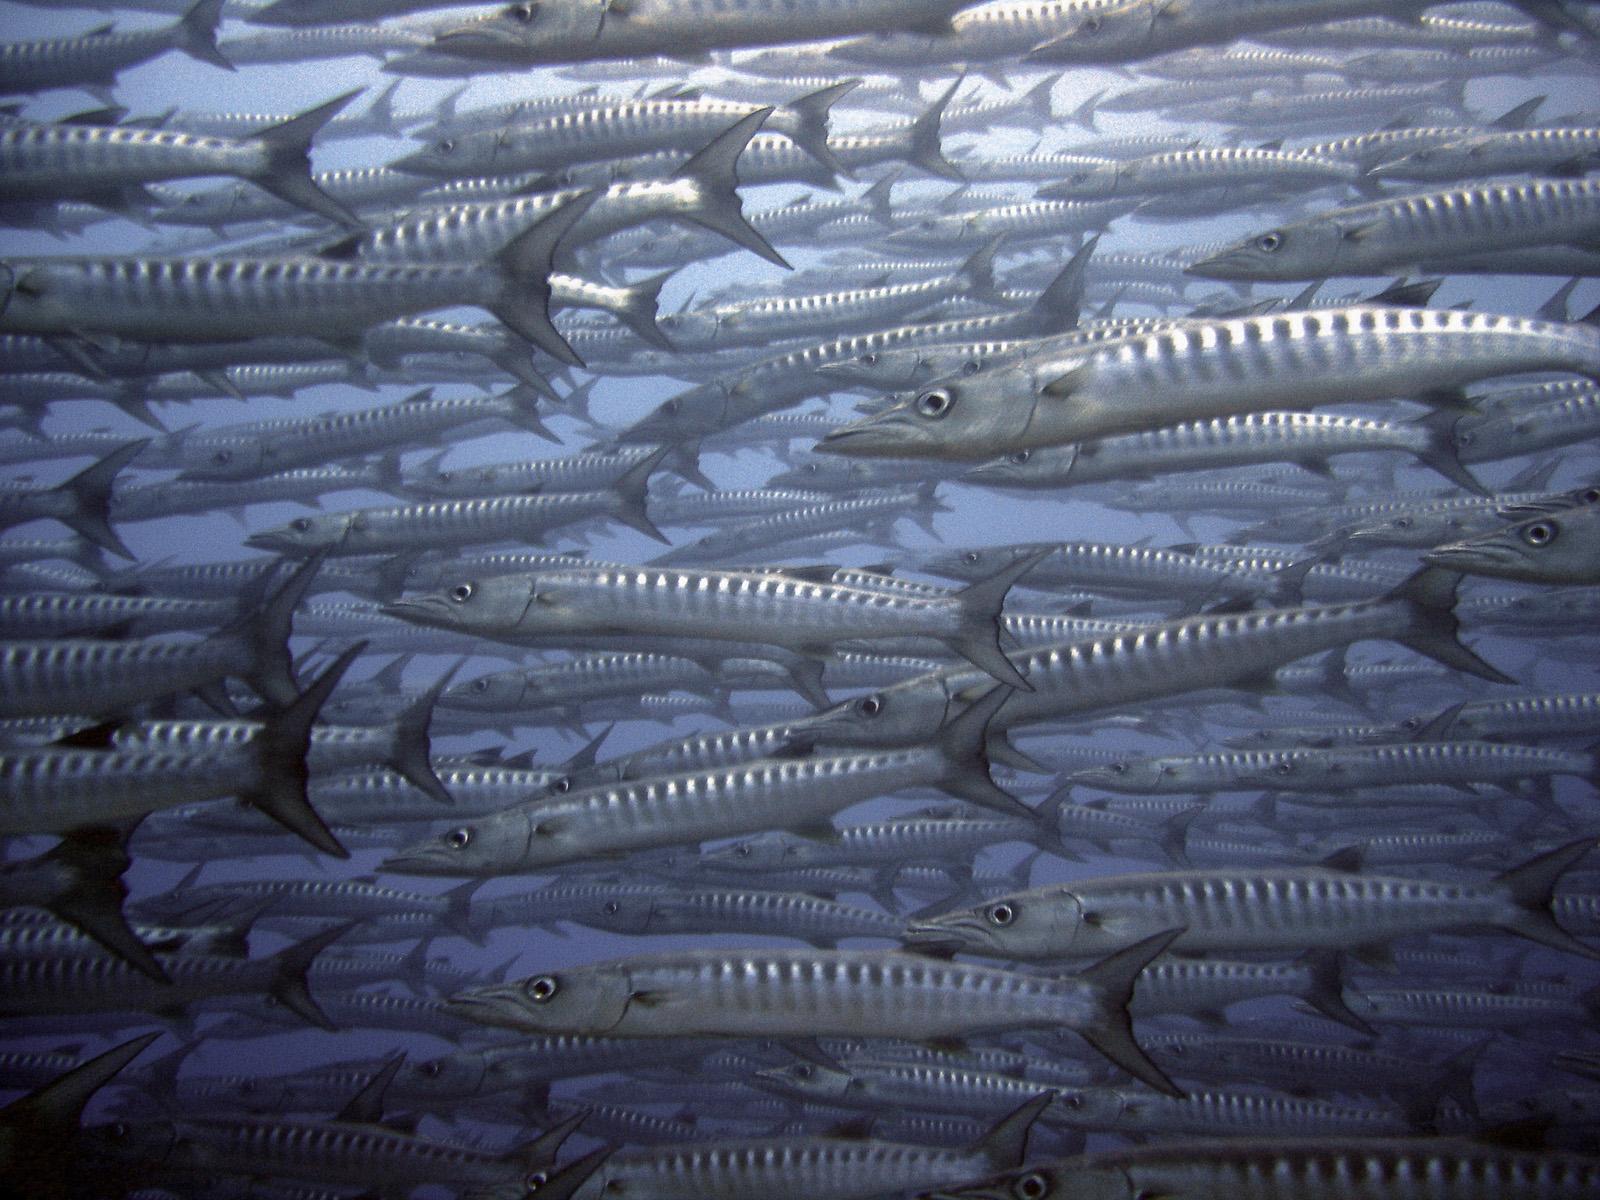 schooling-chevron-barracuda-sphyraena-putnamiae-at-the-world-famous-barracuda-point-sipadan-island-tino-hermann.jpg